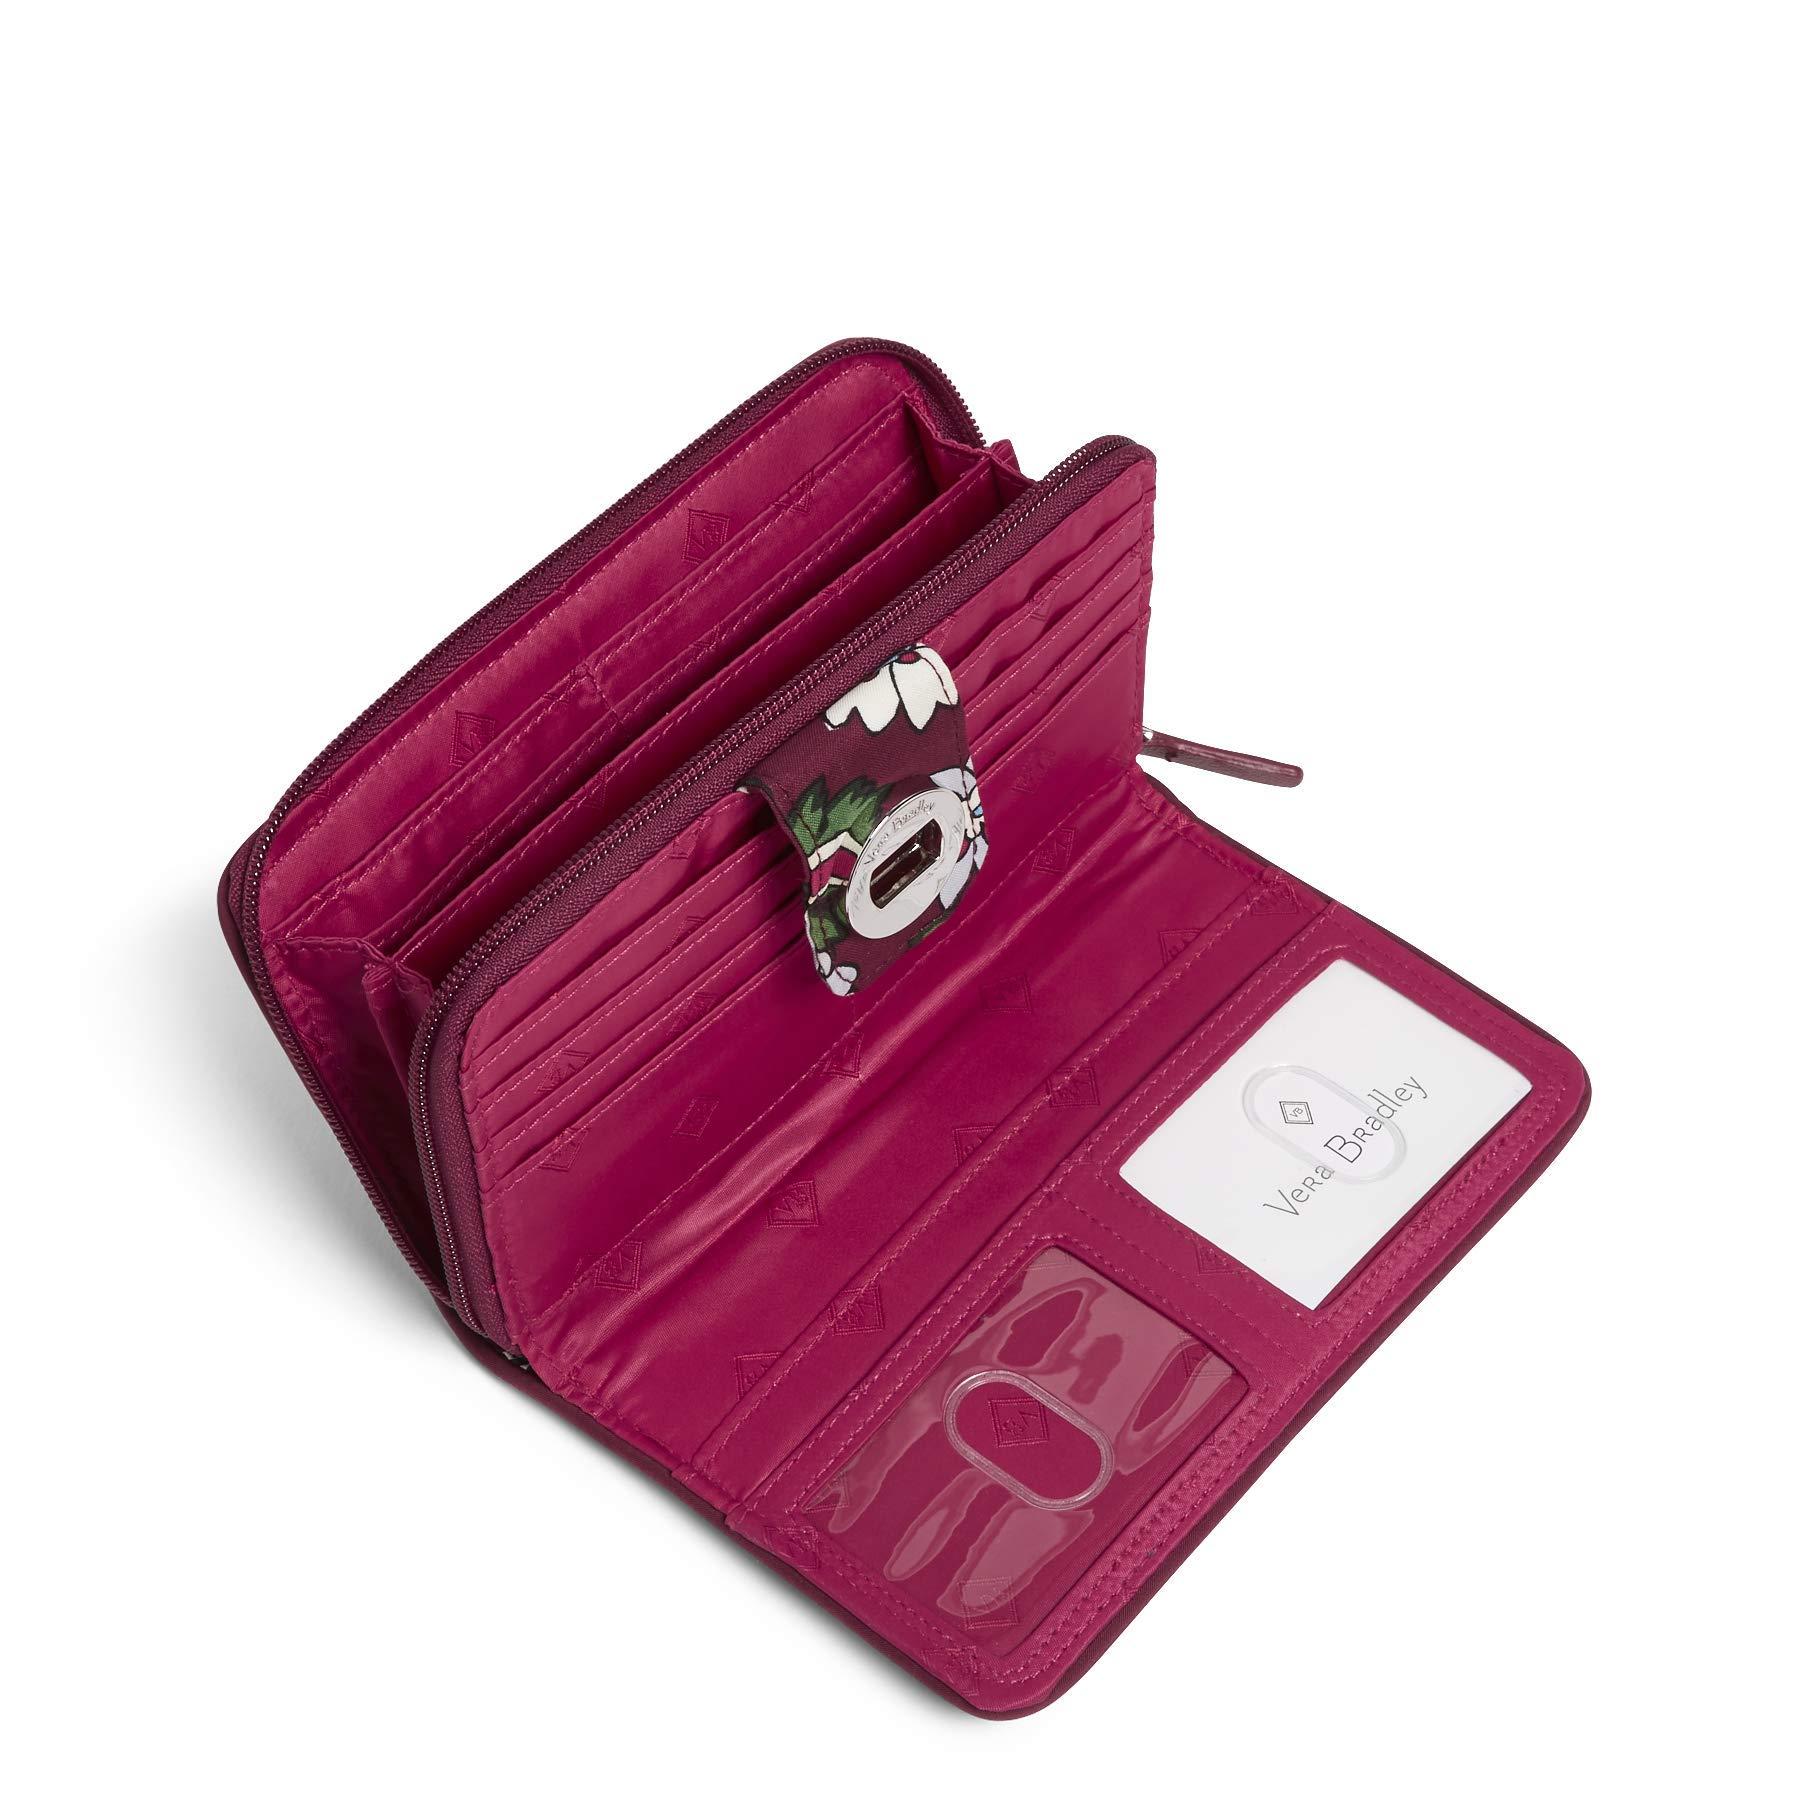 Vera Bradley RFID Turnlock Wallet,  Signature Cotton, One Size by Vera Bradley (Image #3)